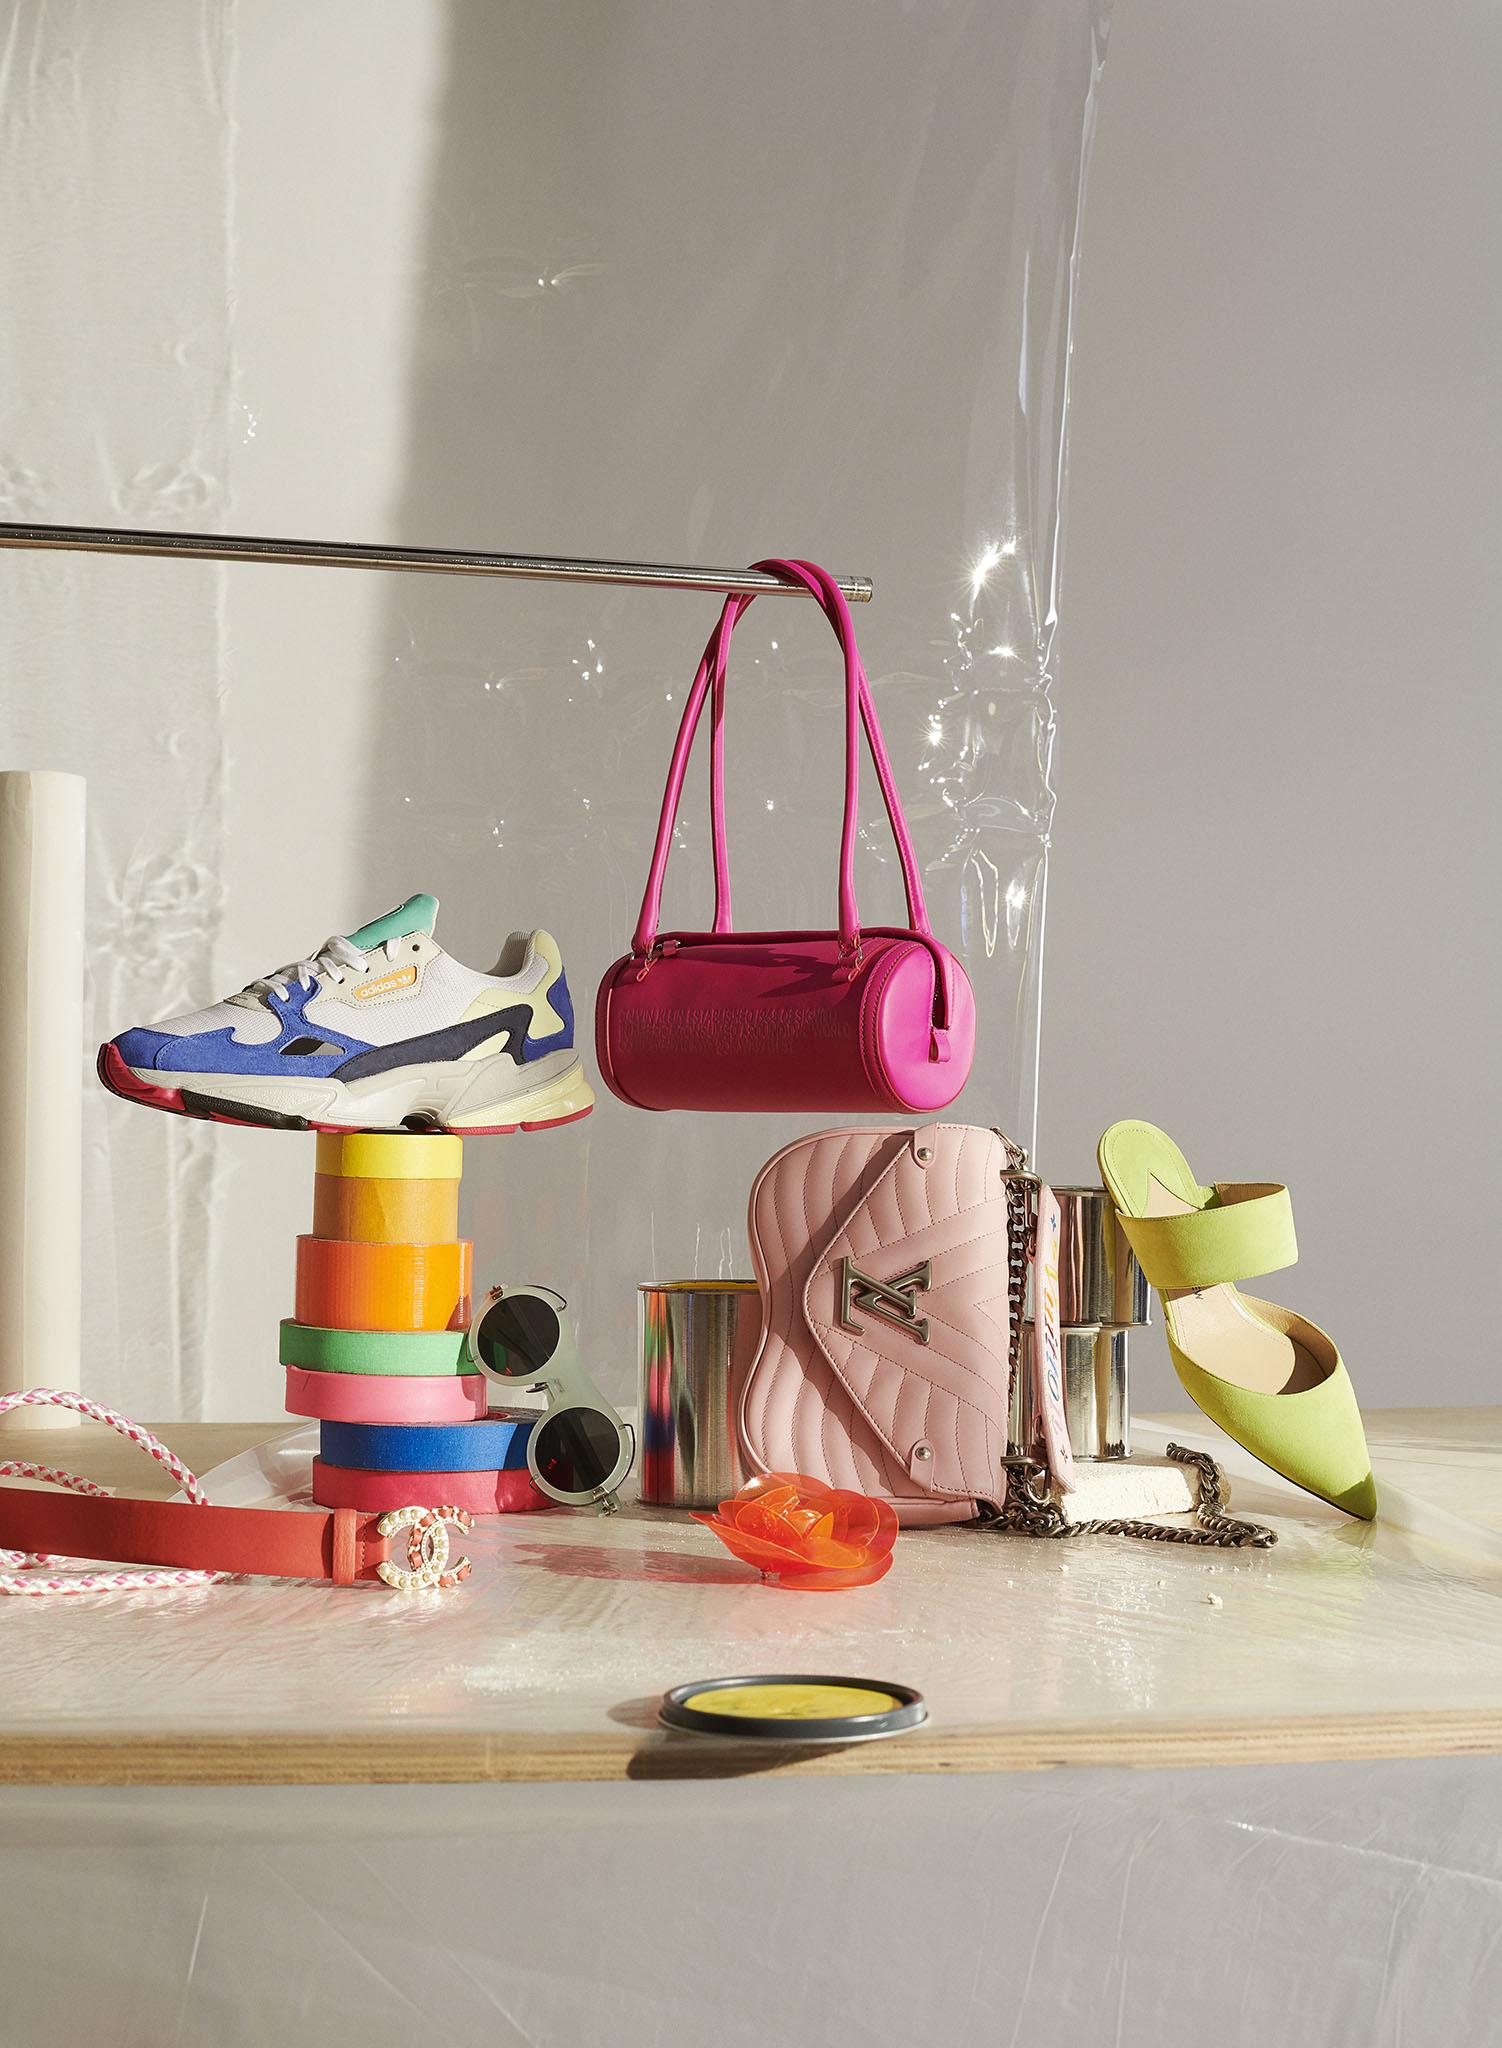 From Left: Chanel belt; Adidas Originals sneaker; Calvin Klein 205W39NYC eyewear; Calvin Klein 205W39NYC bag; Chanel brooch; Louis Vuitton pink bag